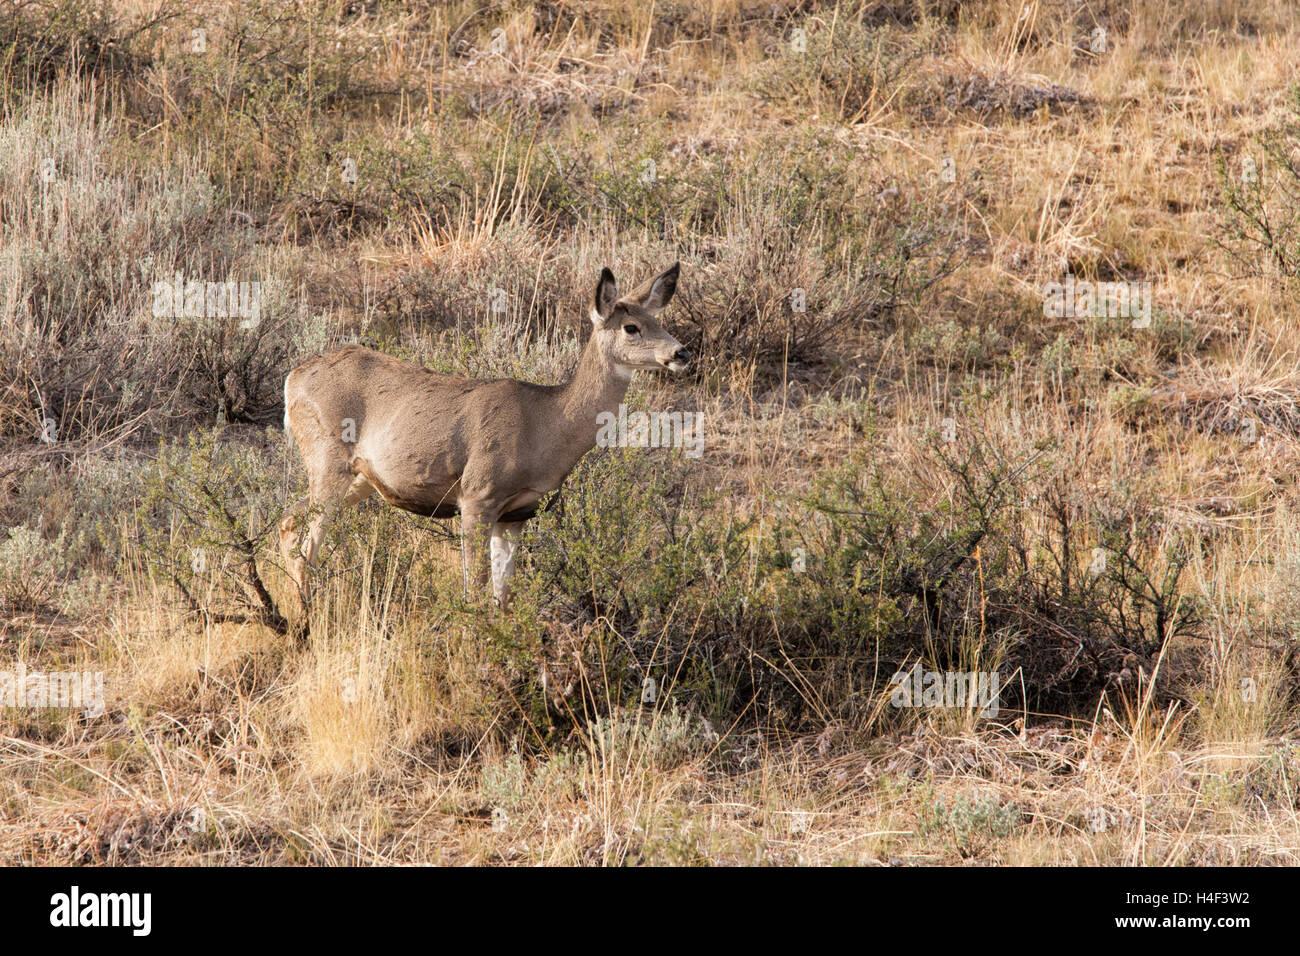 Deer in dry grass. - Stock Image